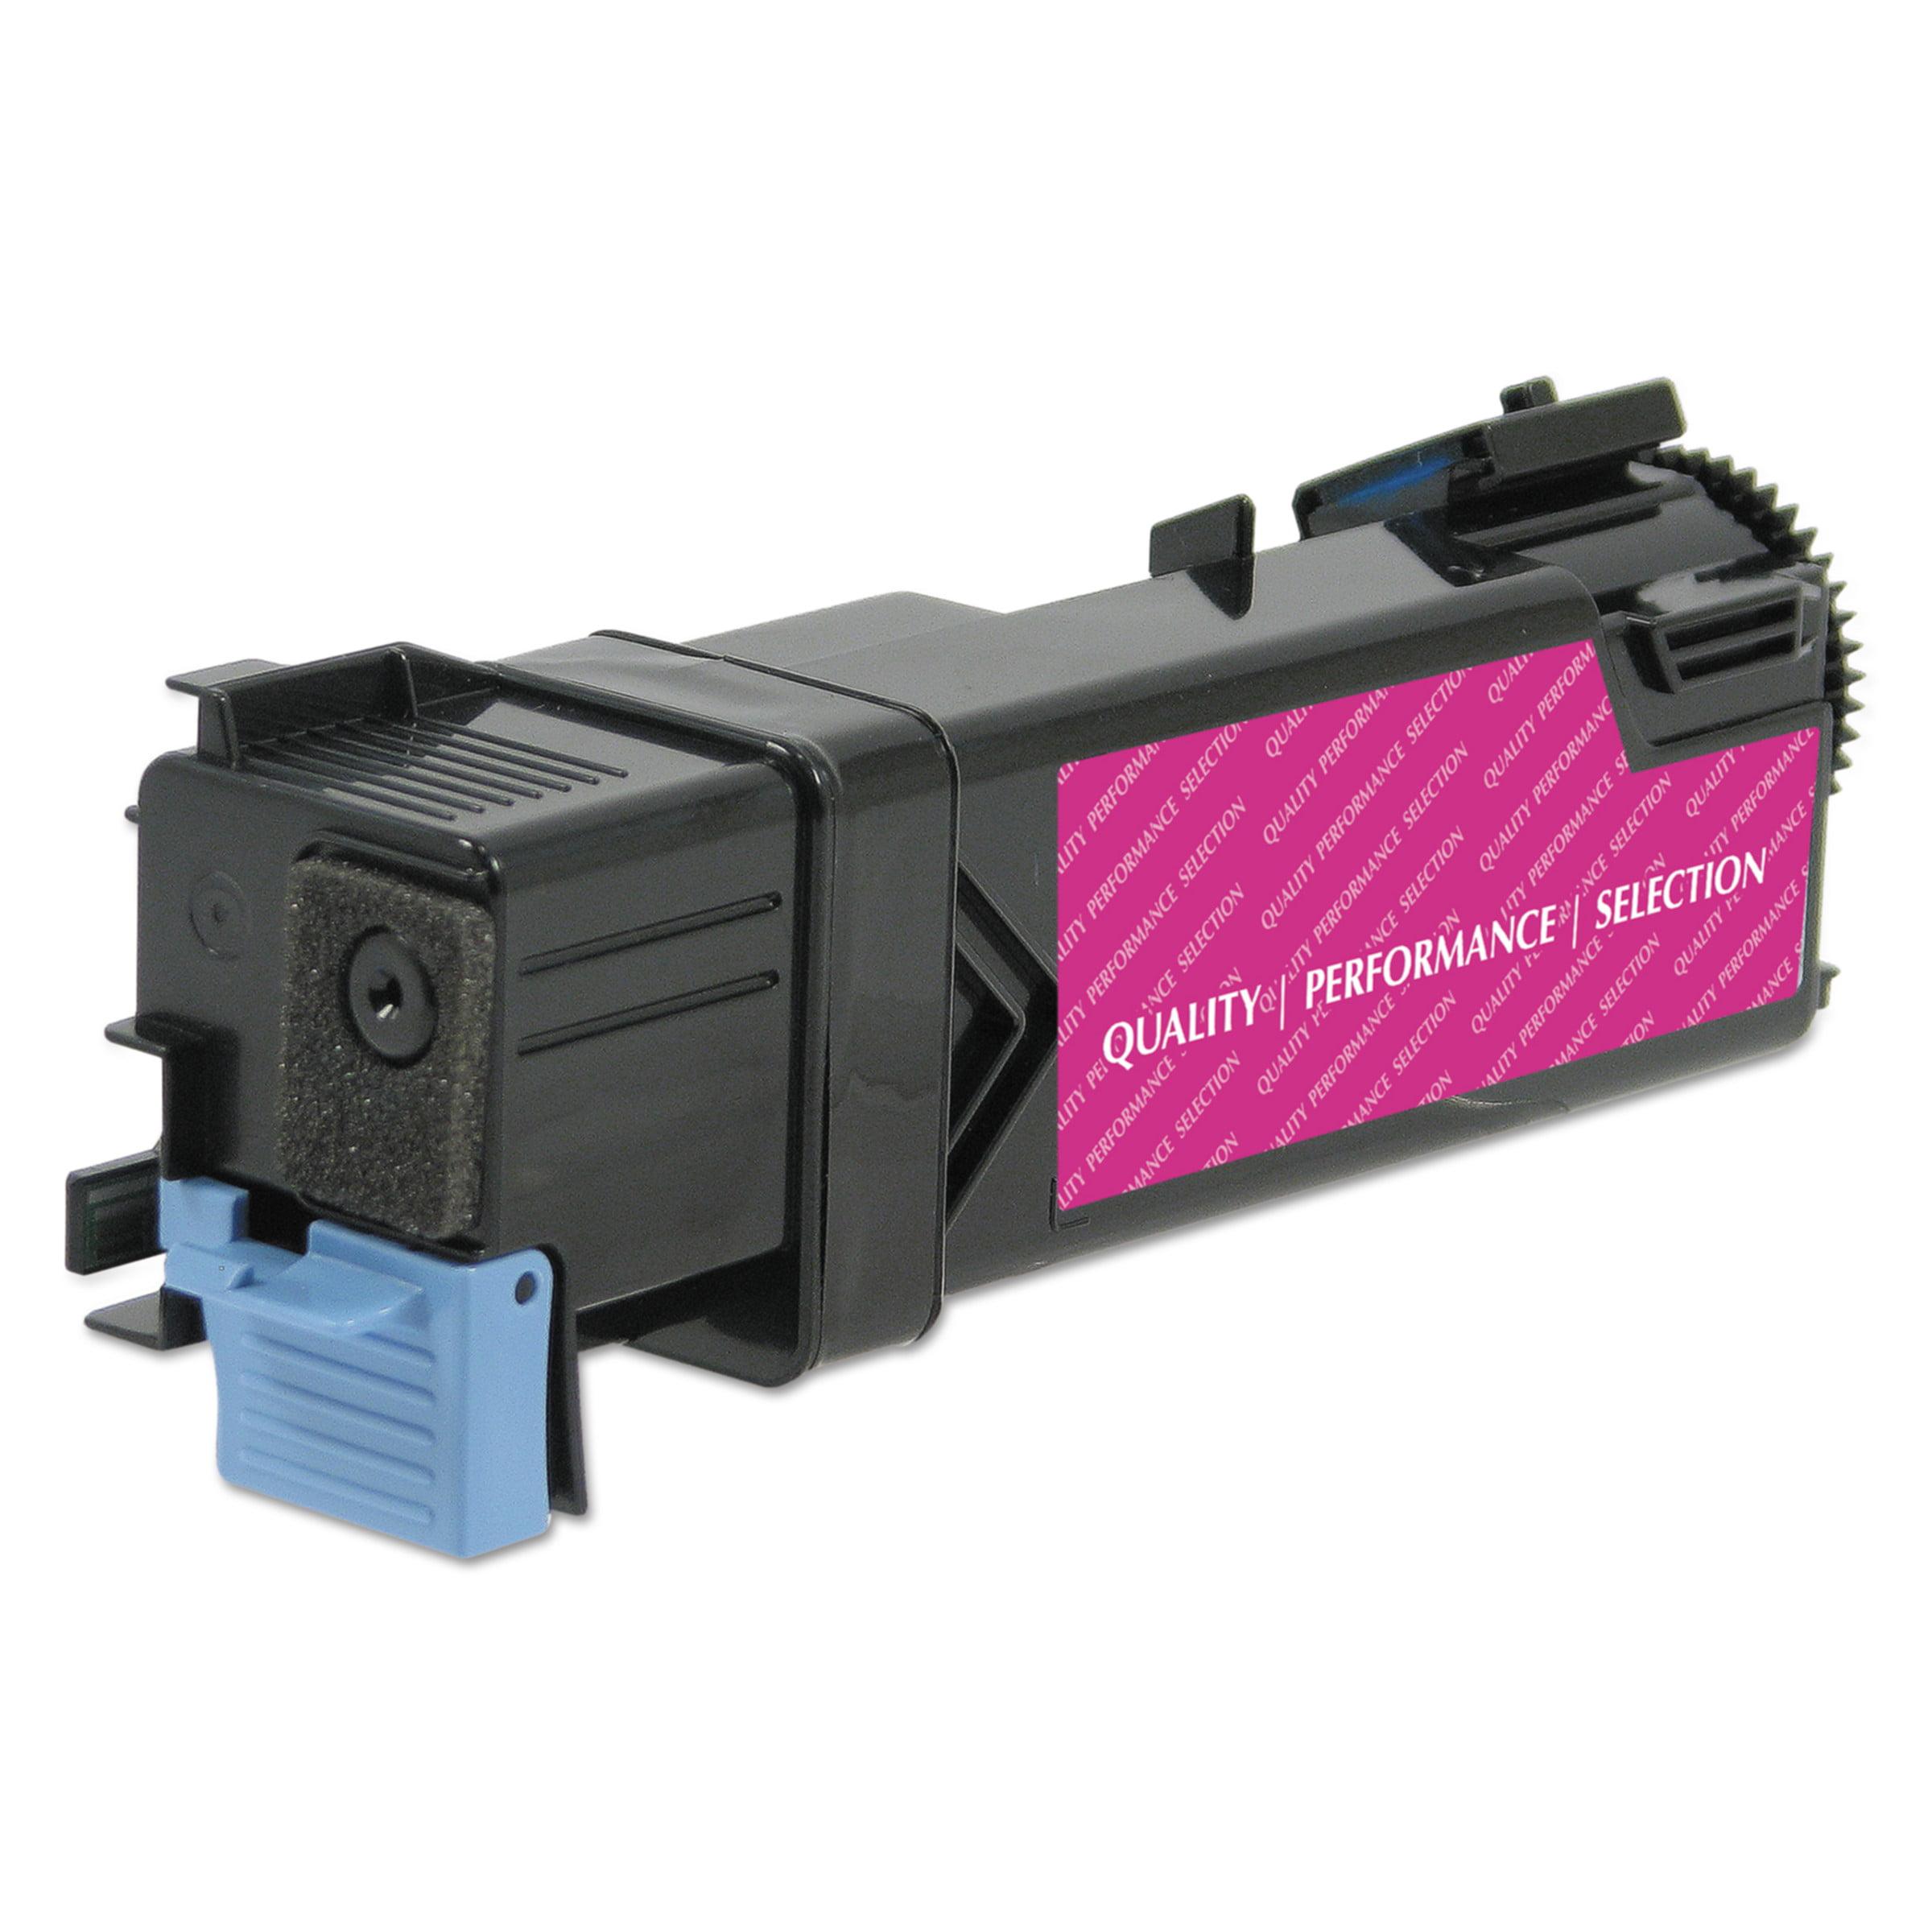 Innovera Remanufactured 331-0717 (2150) Magenta Toner Cartridge